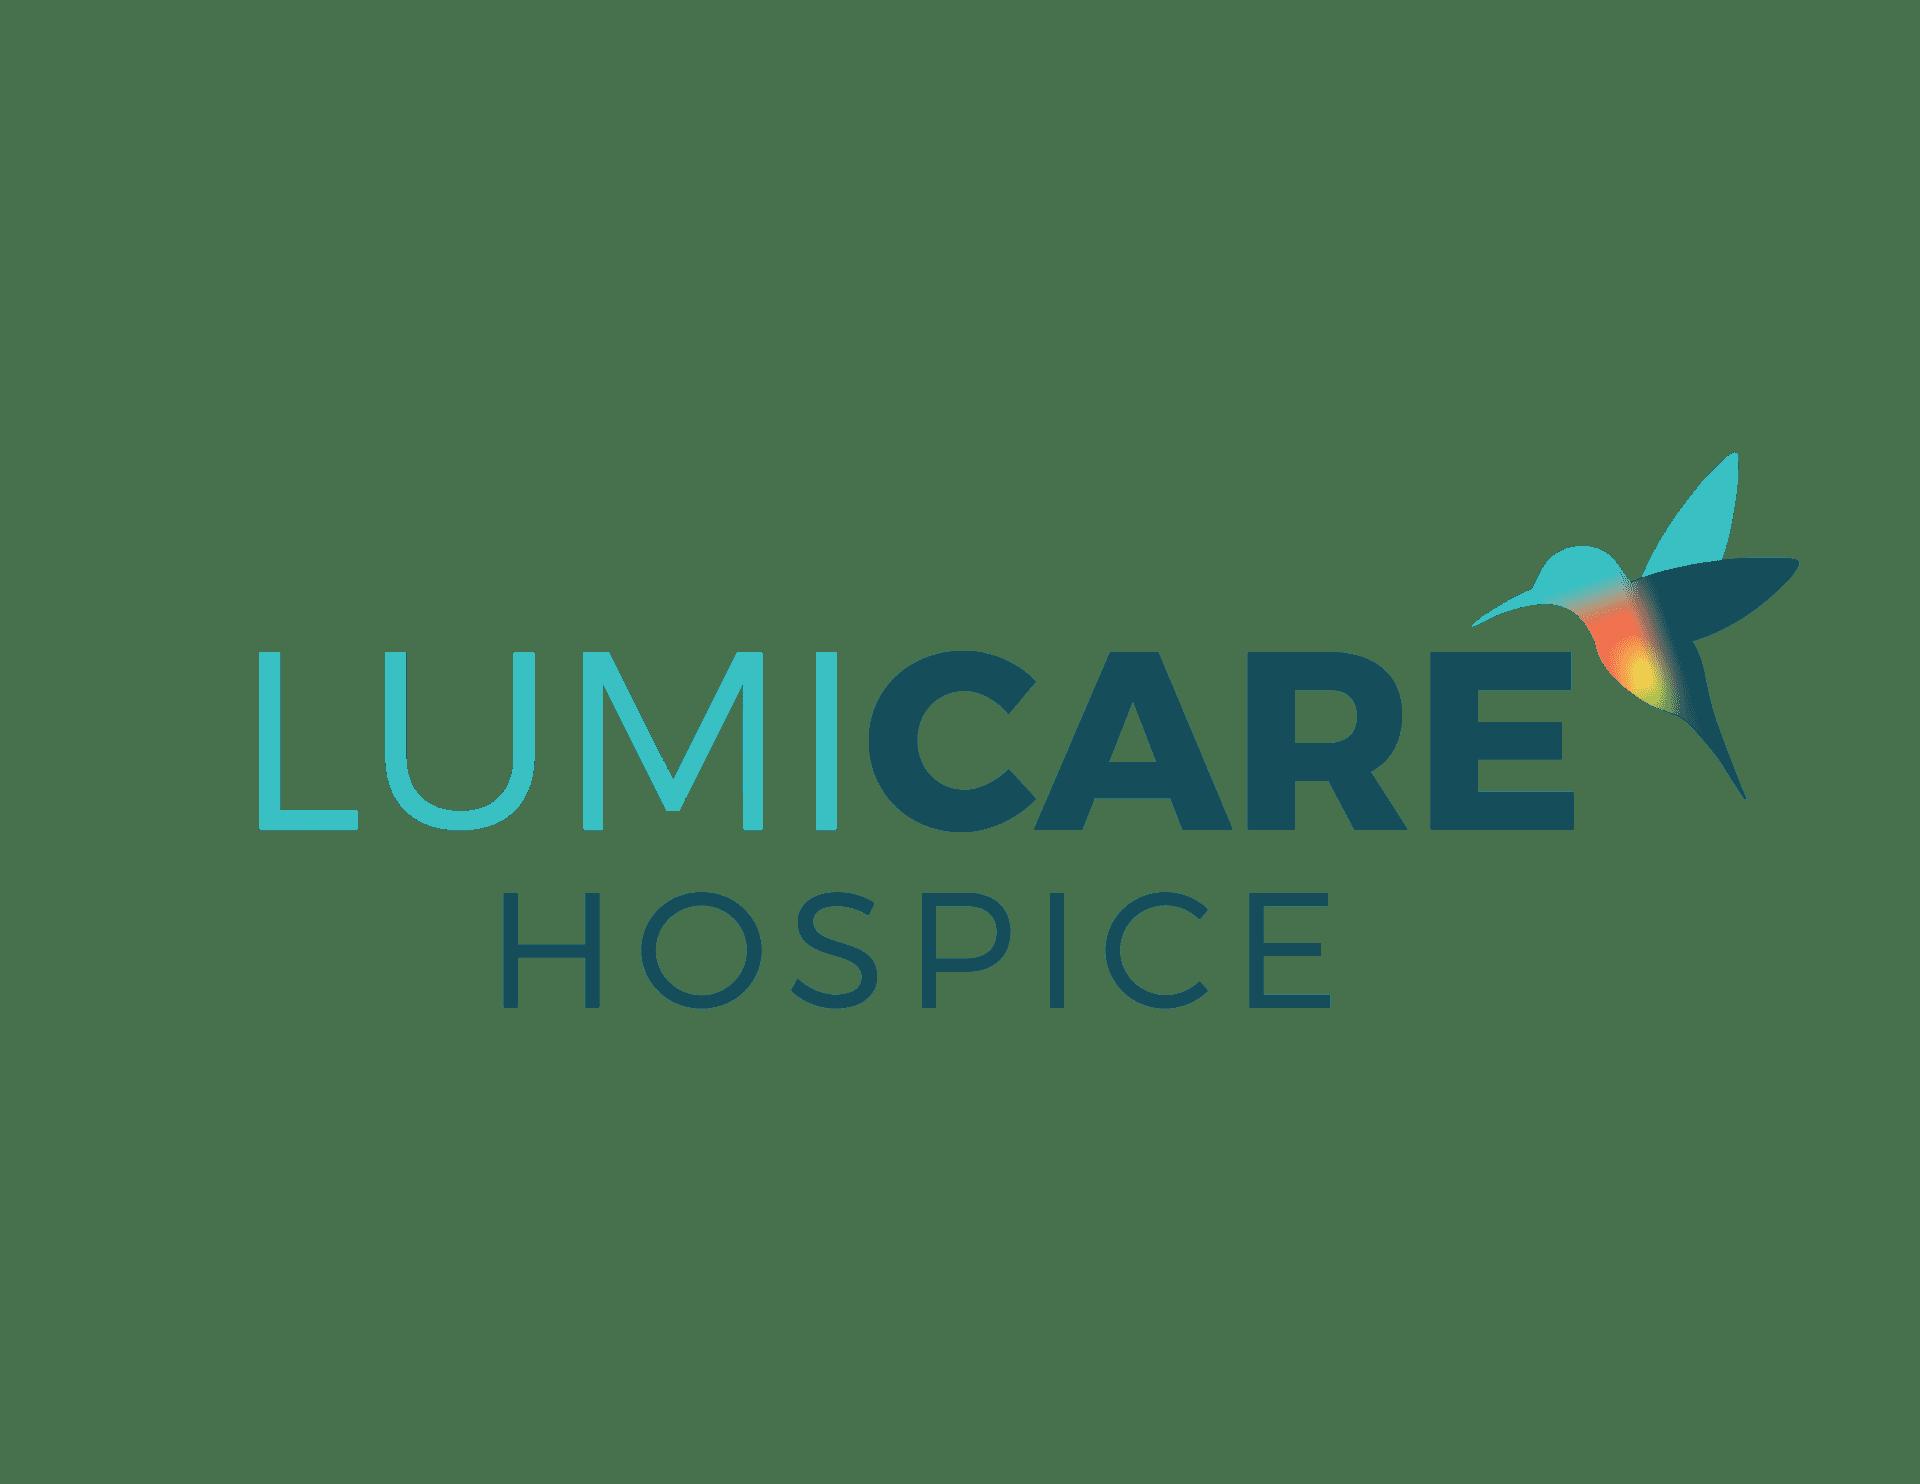 Lumicare Hospice LLC Logo - Final Hospice Color